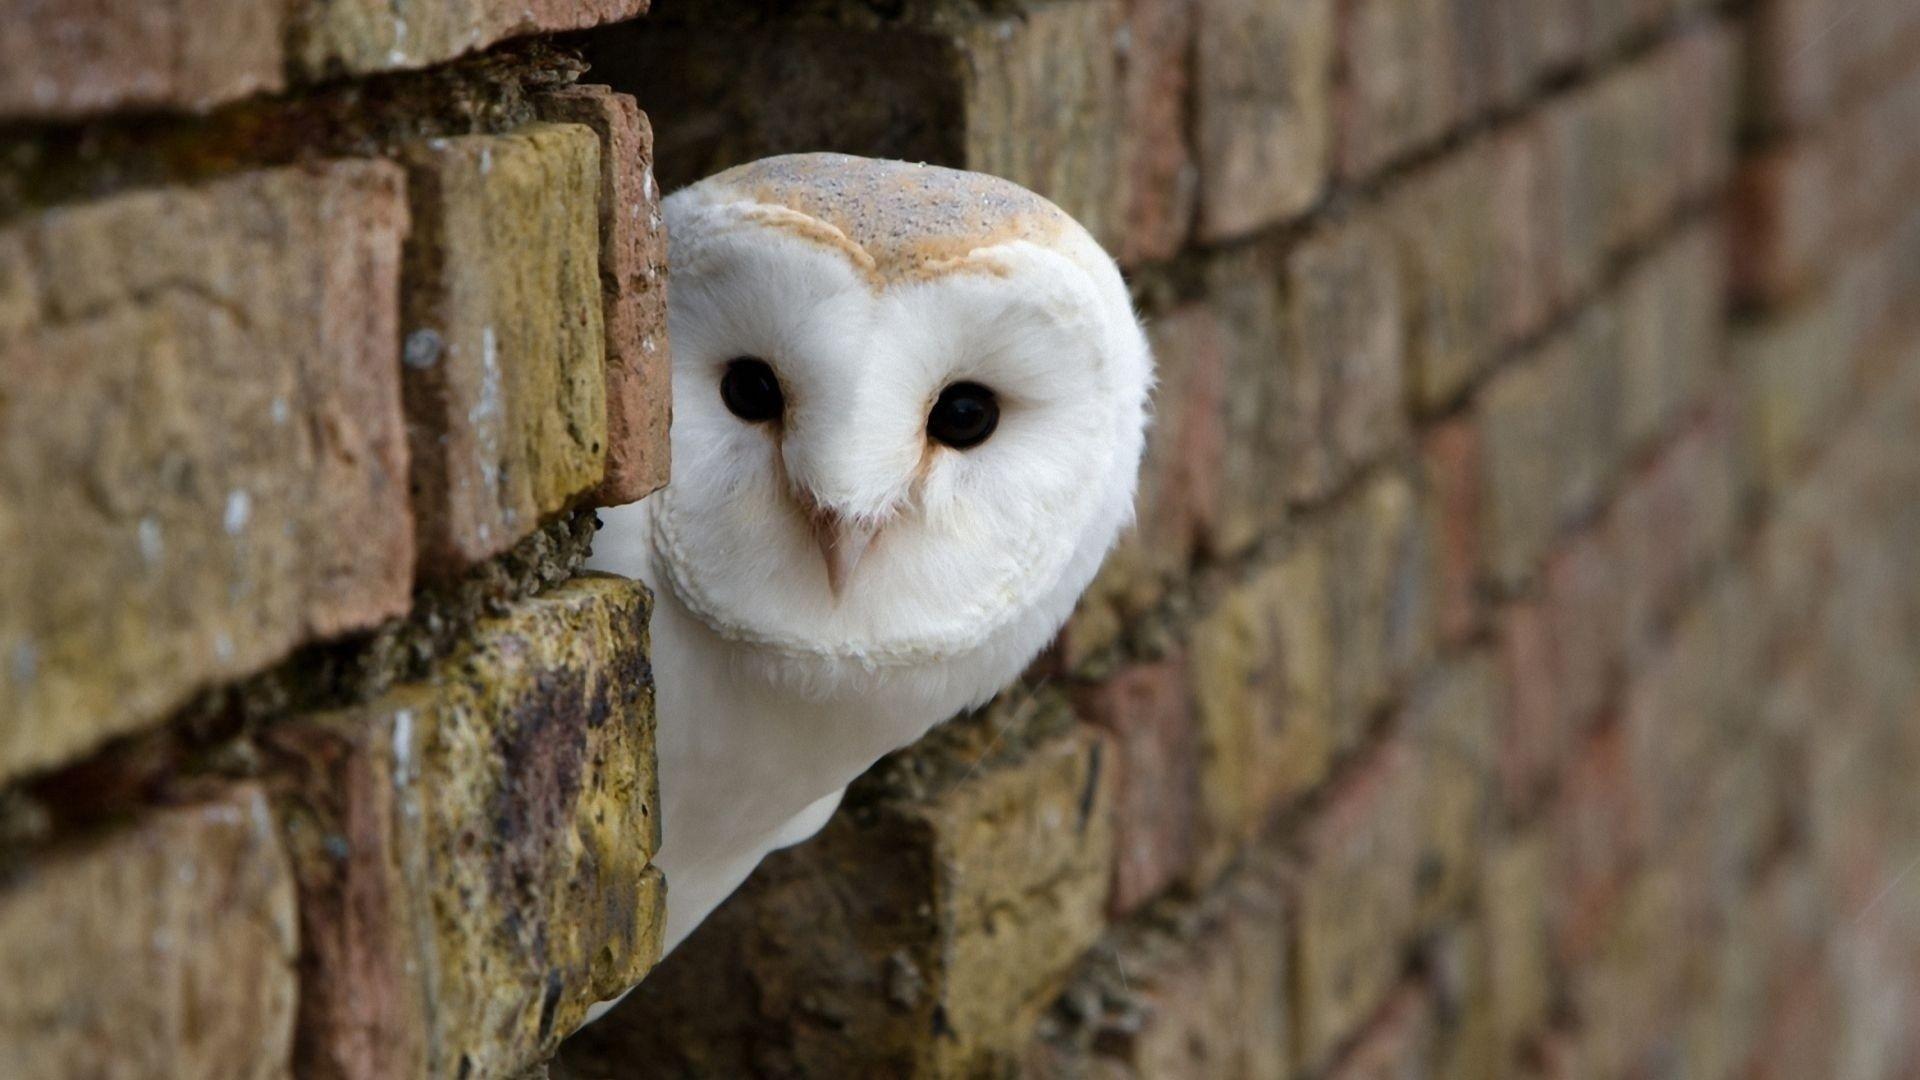 Cute Owl Wallpaper For Desktop and You Like This Cute Bird Wallpaper